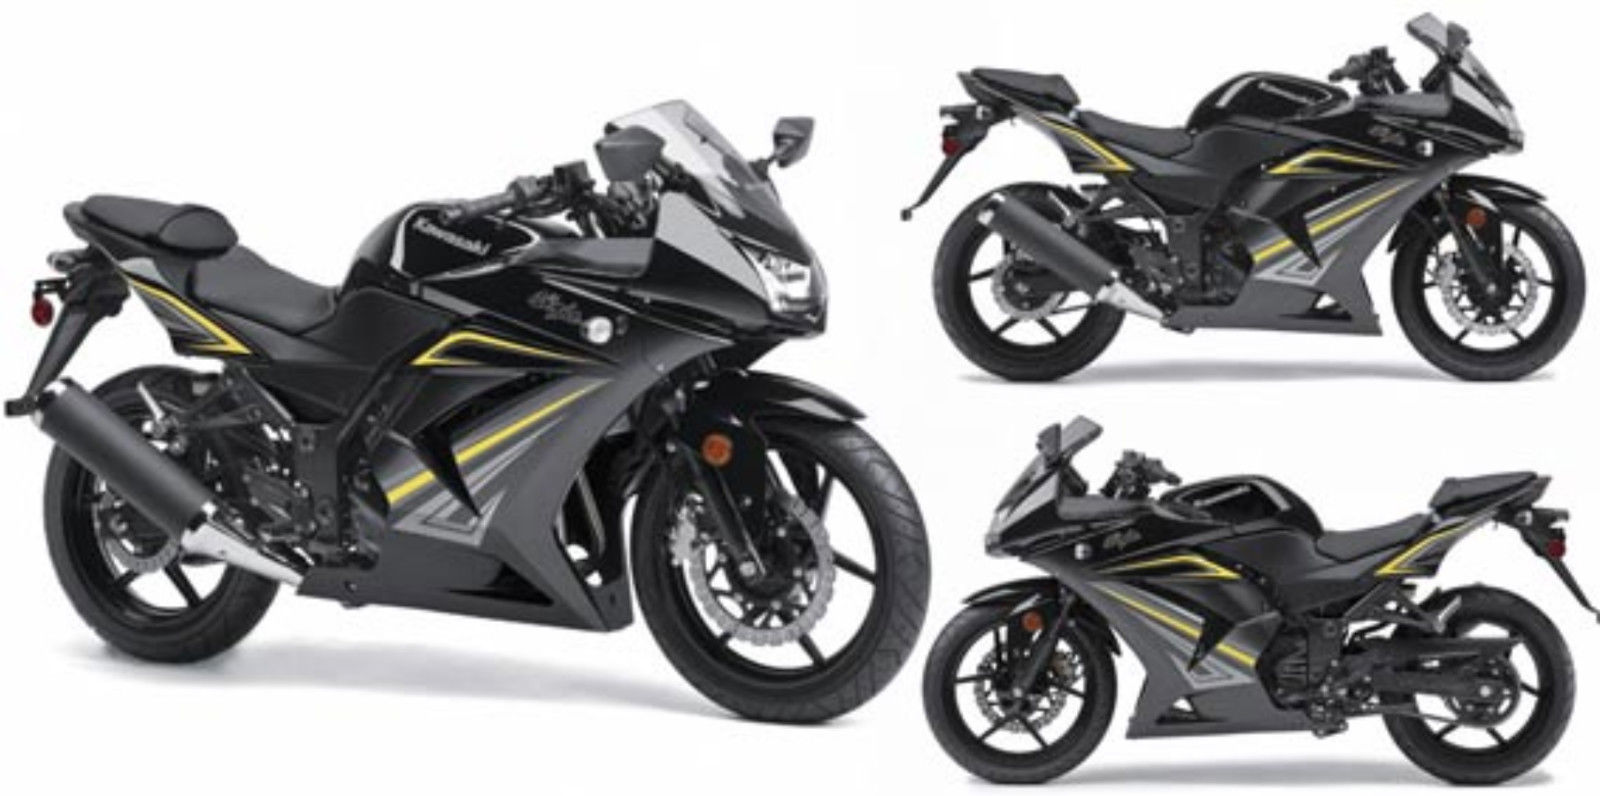 2012 Kawasaki Ninja 250r Ex250jcfa Motorcycle Black